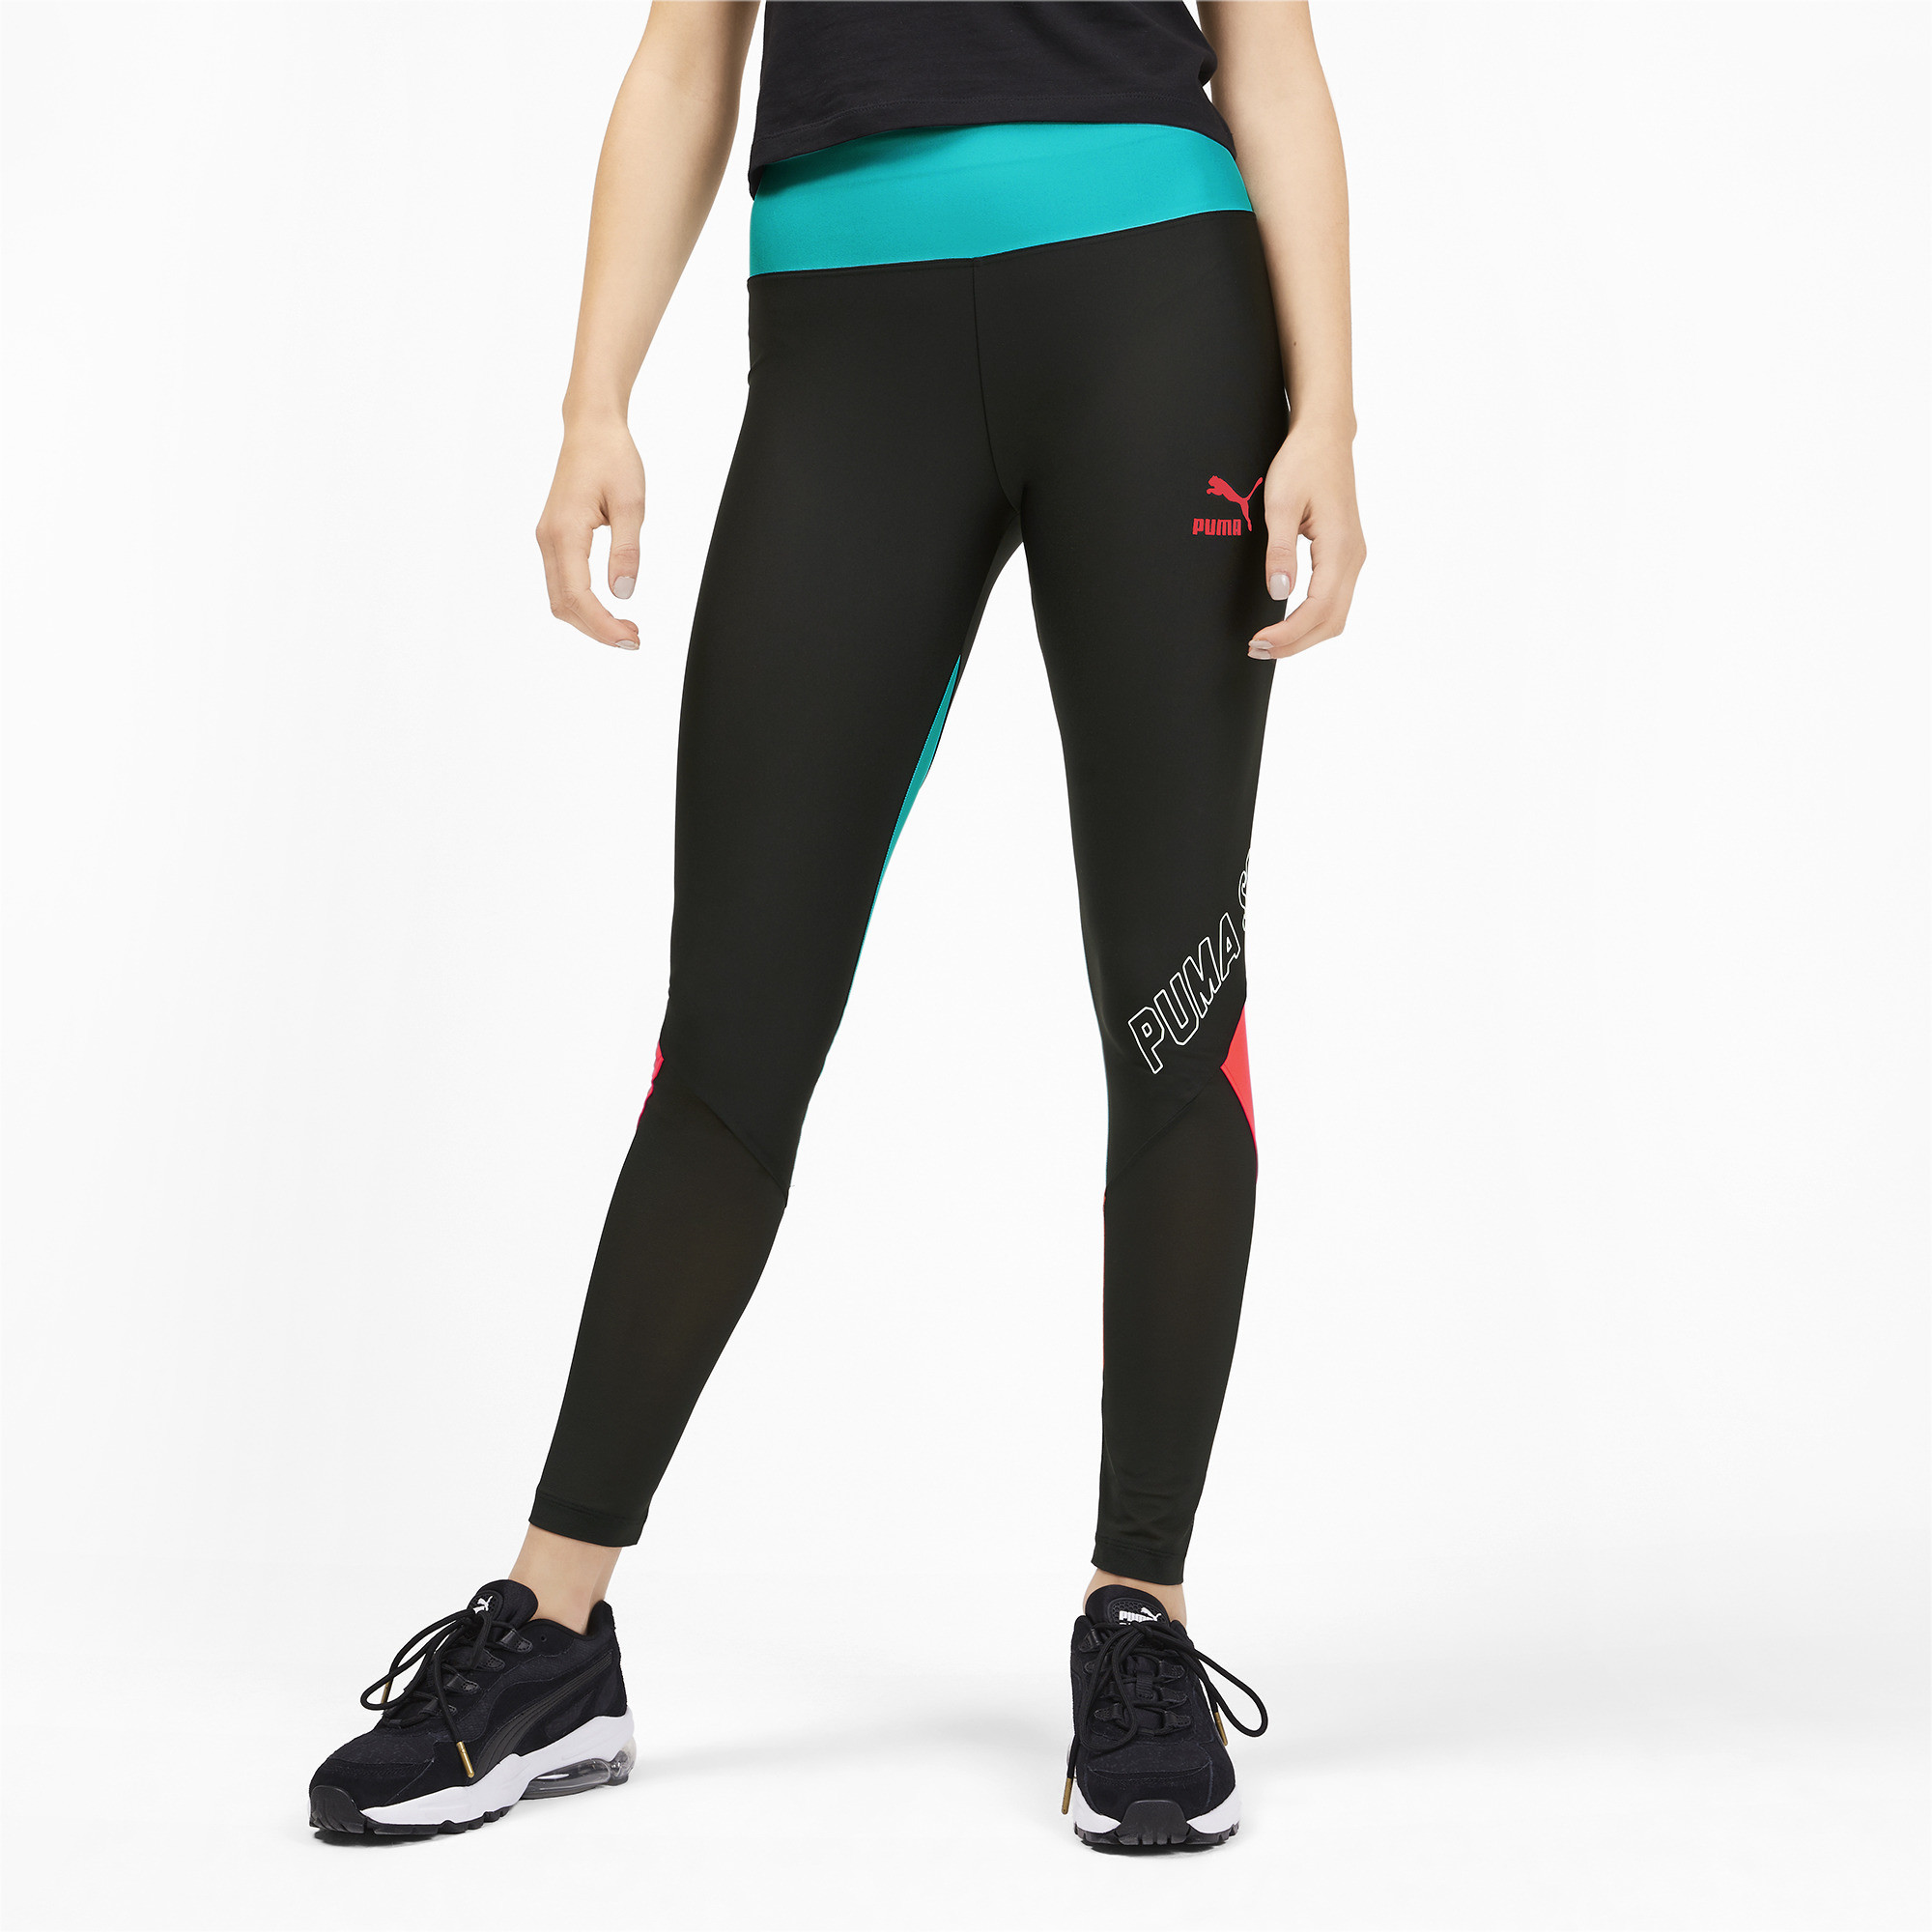 PUMA-luXTG-Women-s-Leggings-Sport-Classics thumbnail 9